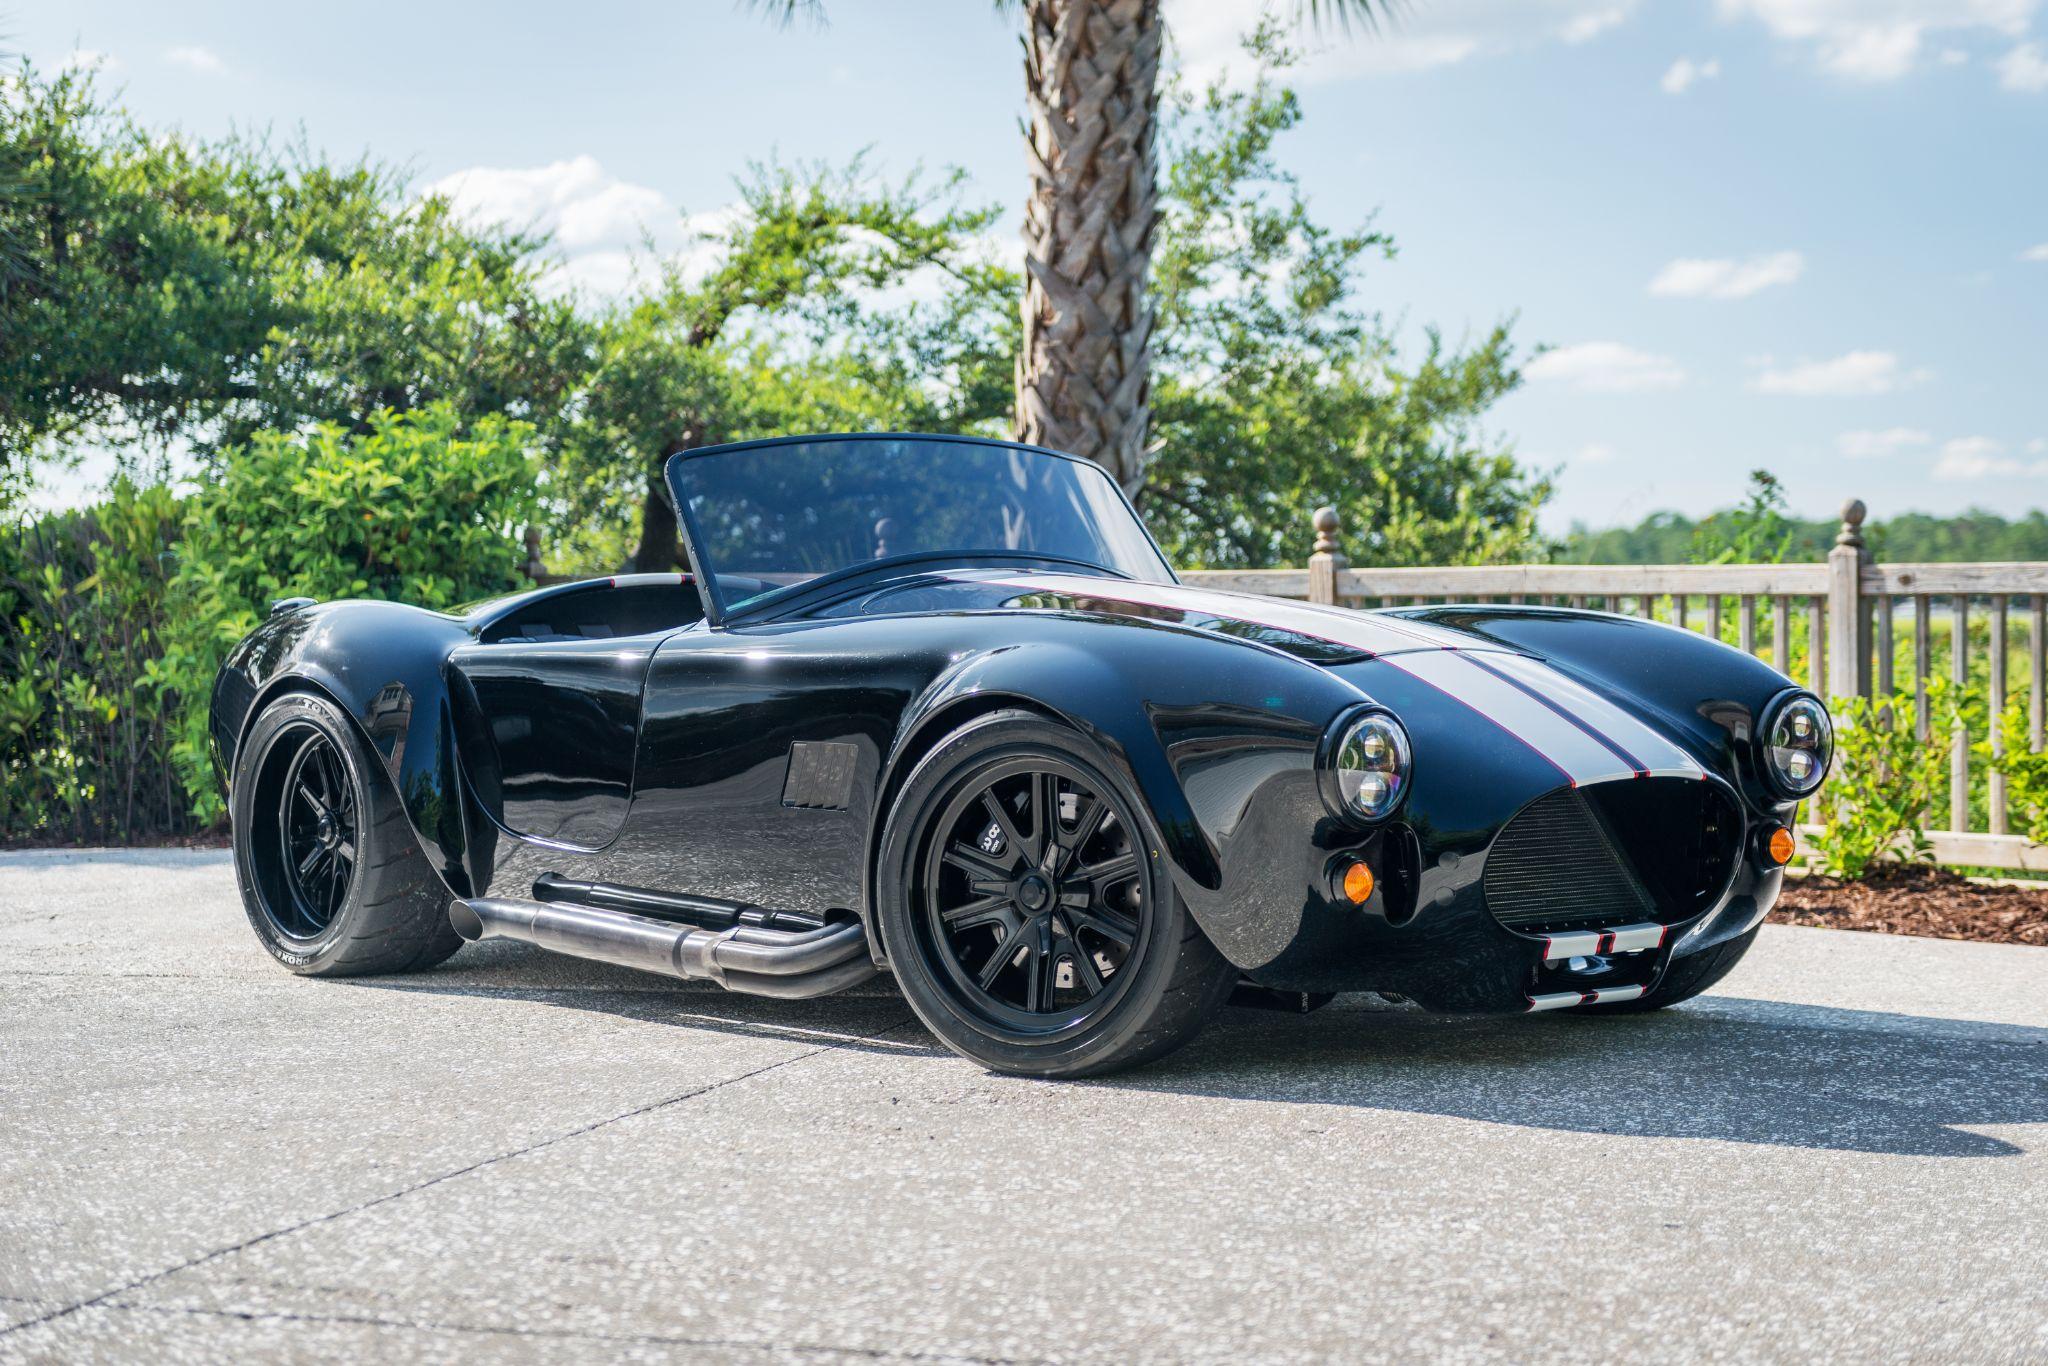 Factory Five Cobra For Sale >> Ford Cobra Superforance For Sale Autabuy Com Cozot Cars